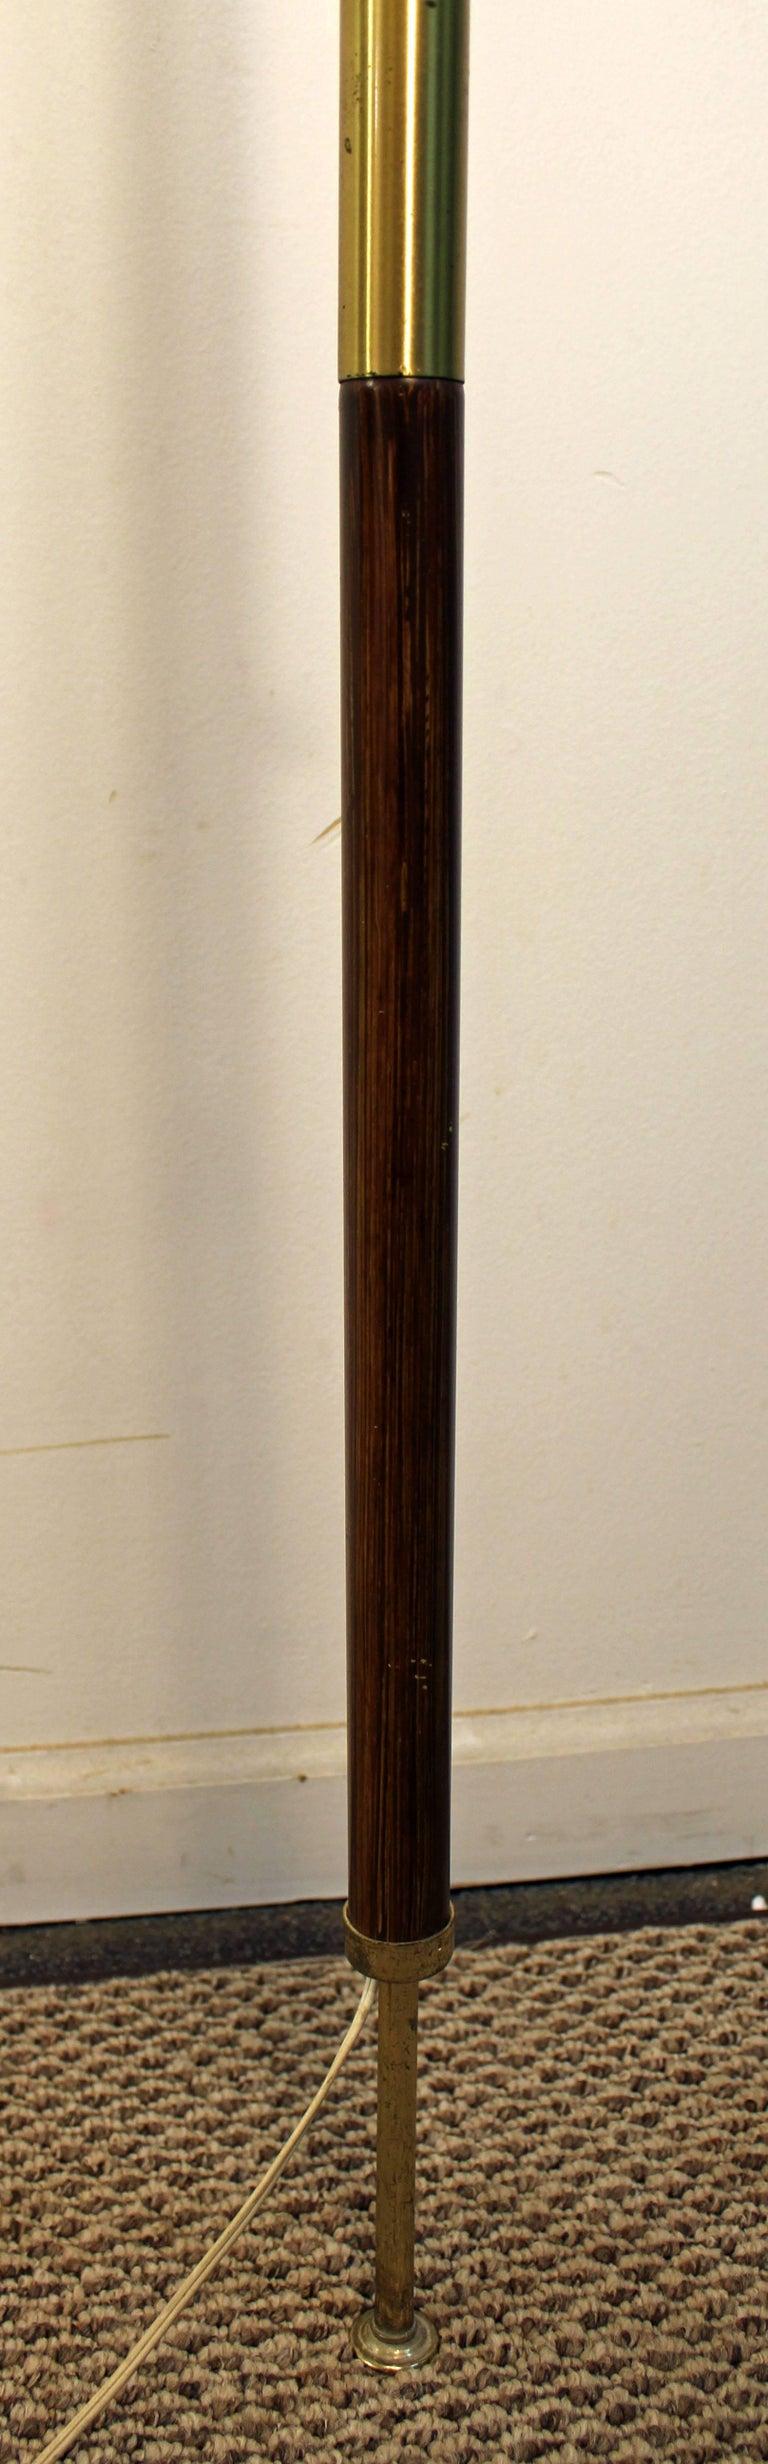 Midcentury Danish Modern Walnut Brass Three Way Tension Pole Lamp At 1stdibs